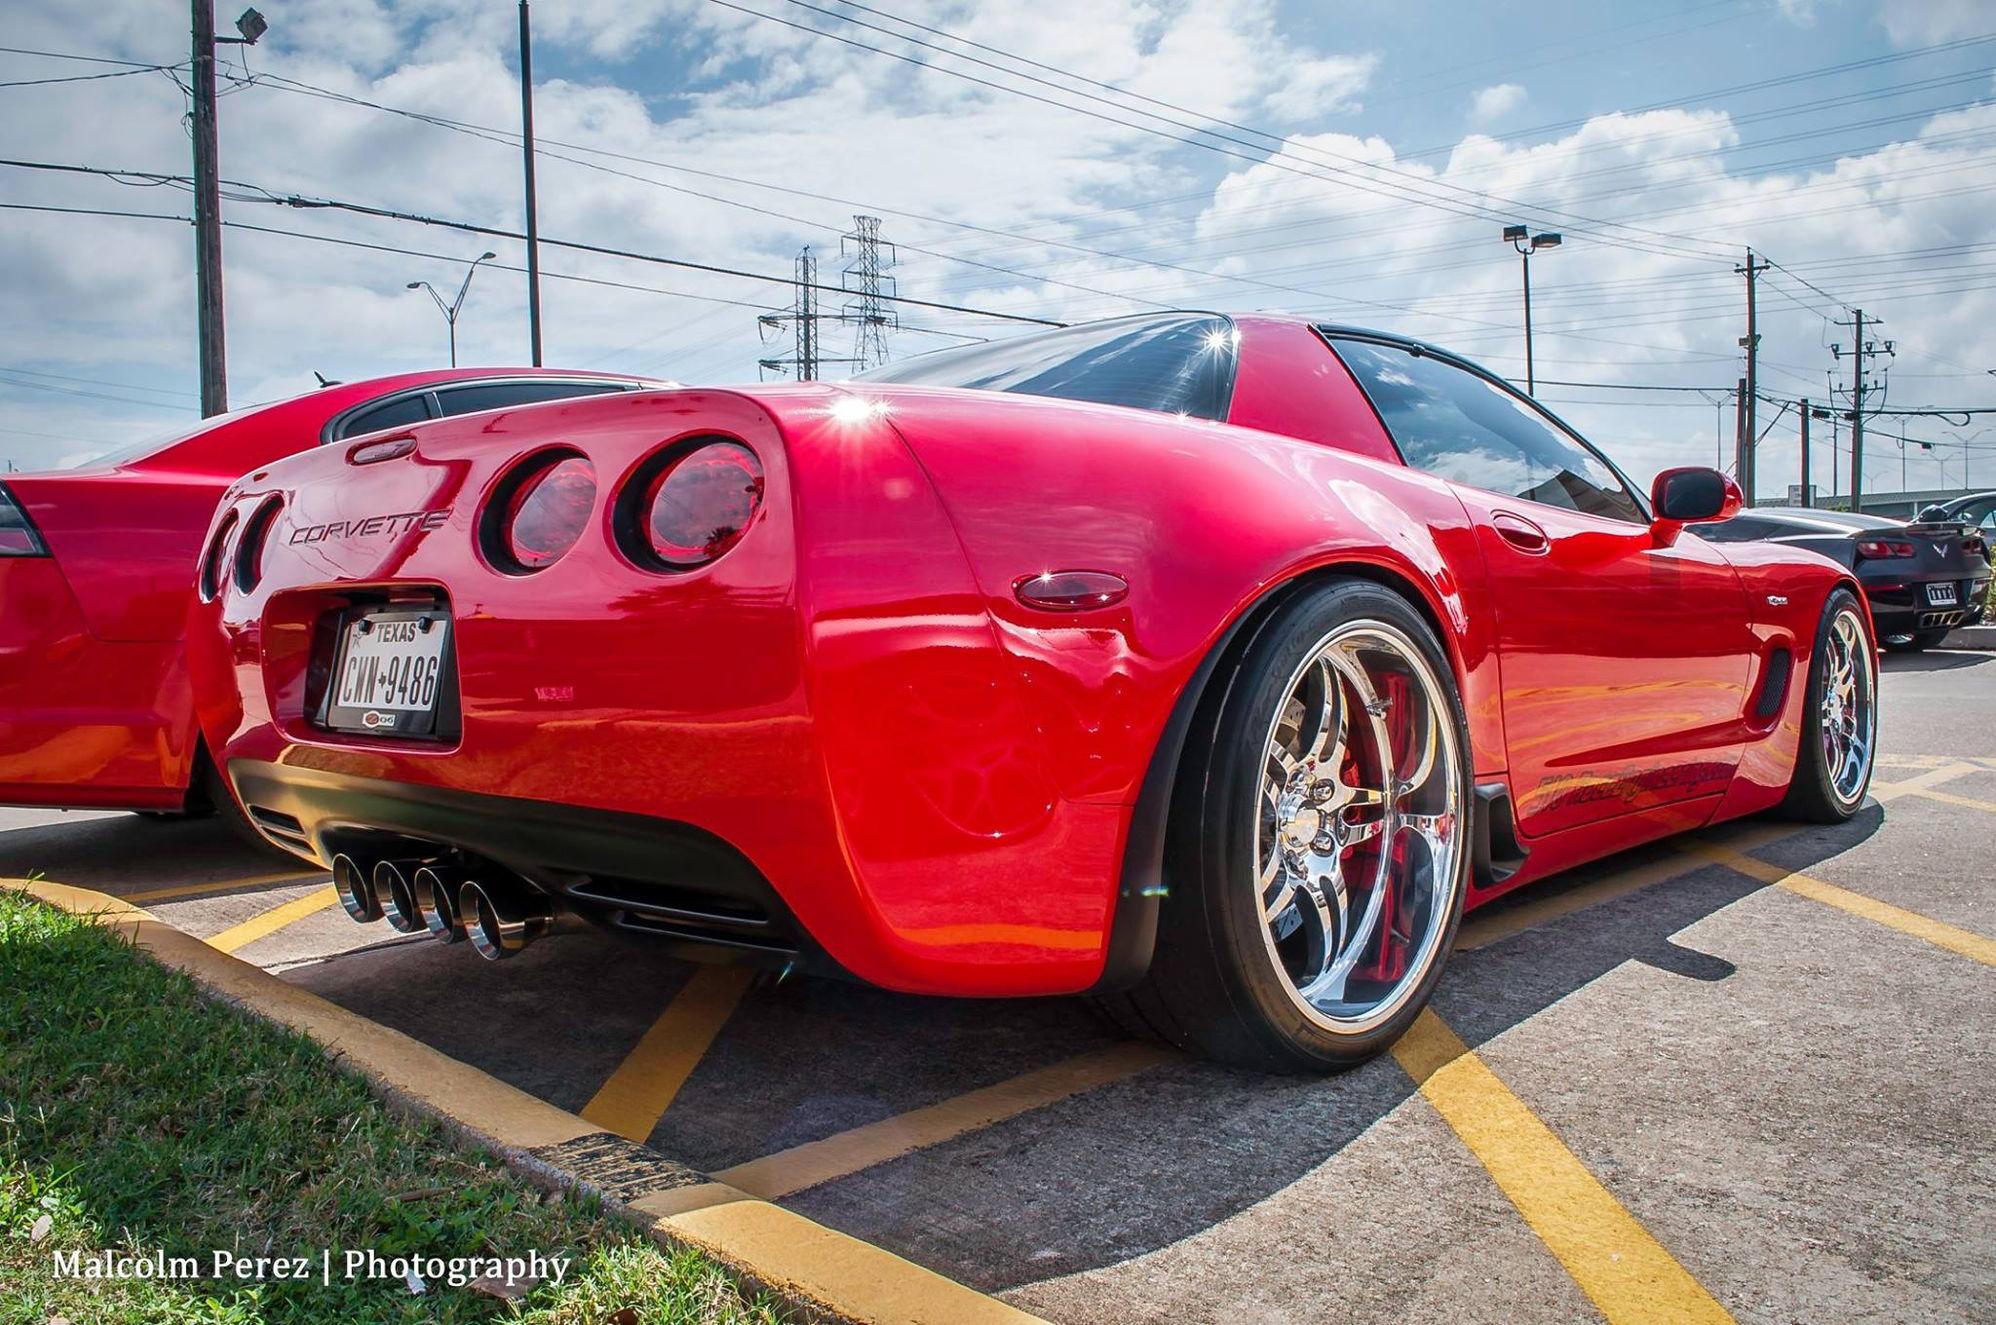 New Chevrolet Corvette Huntsville >> All new CCW SP540 hybrid 19/20 setup - Page 2 - CorvetteForum - Chevrolet Corvette Forum Discussion